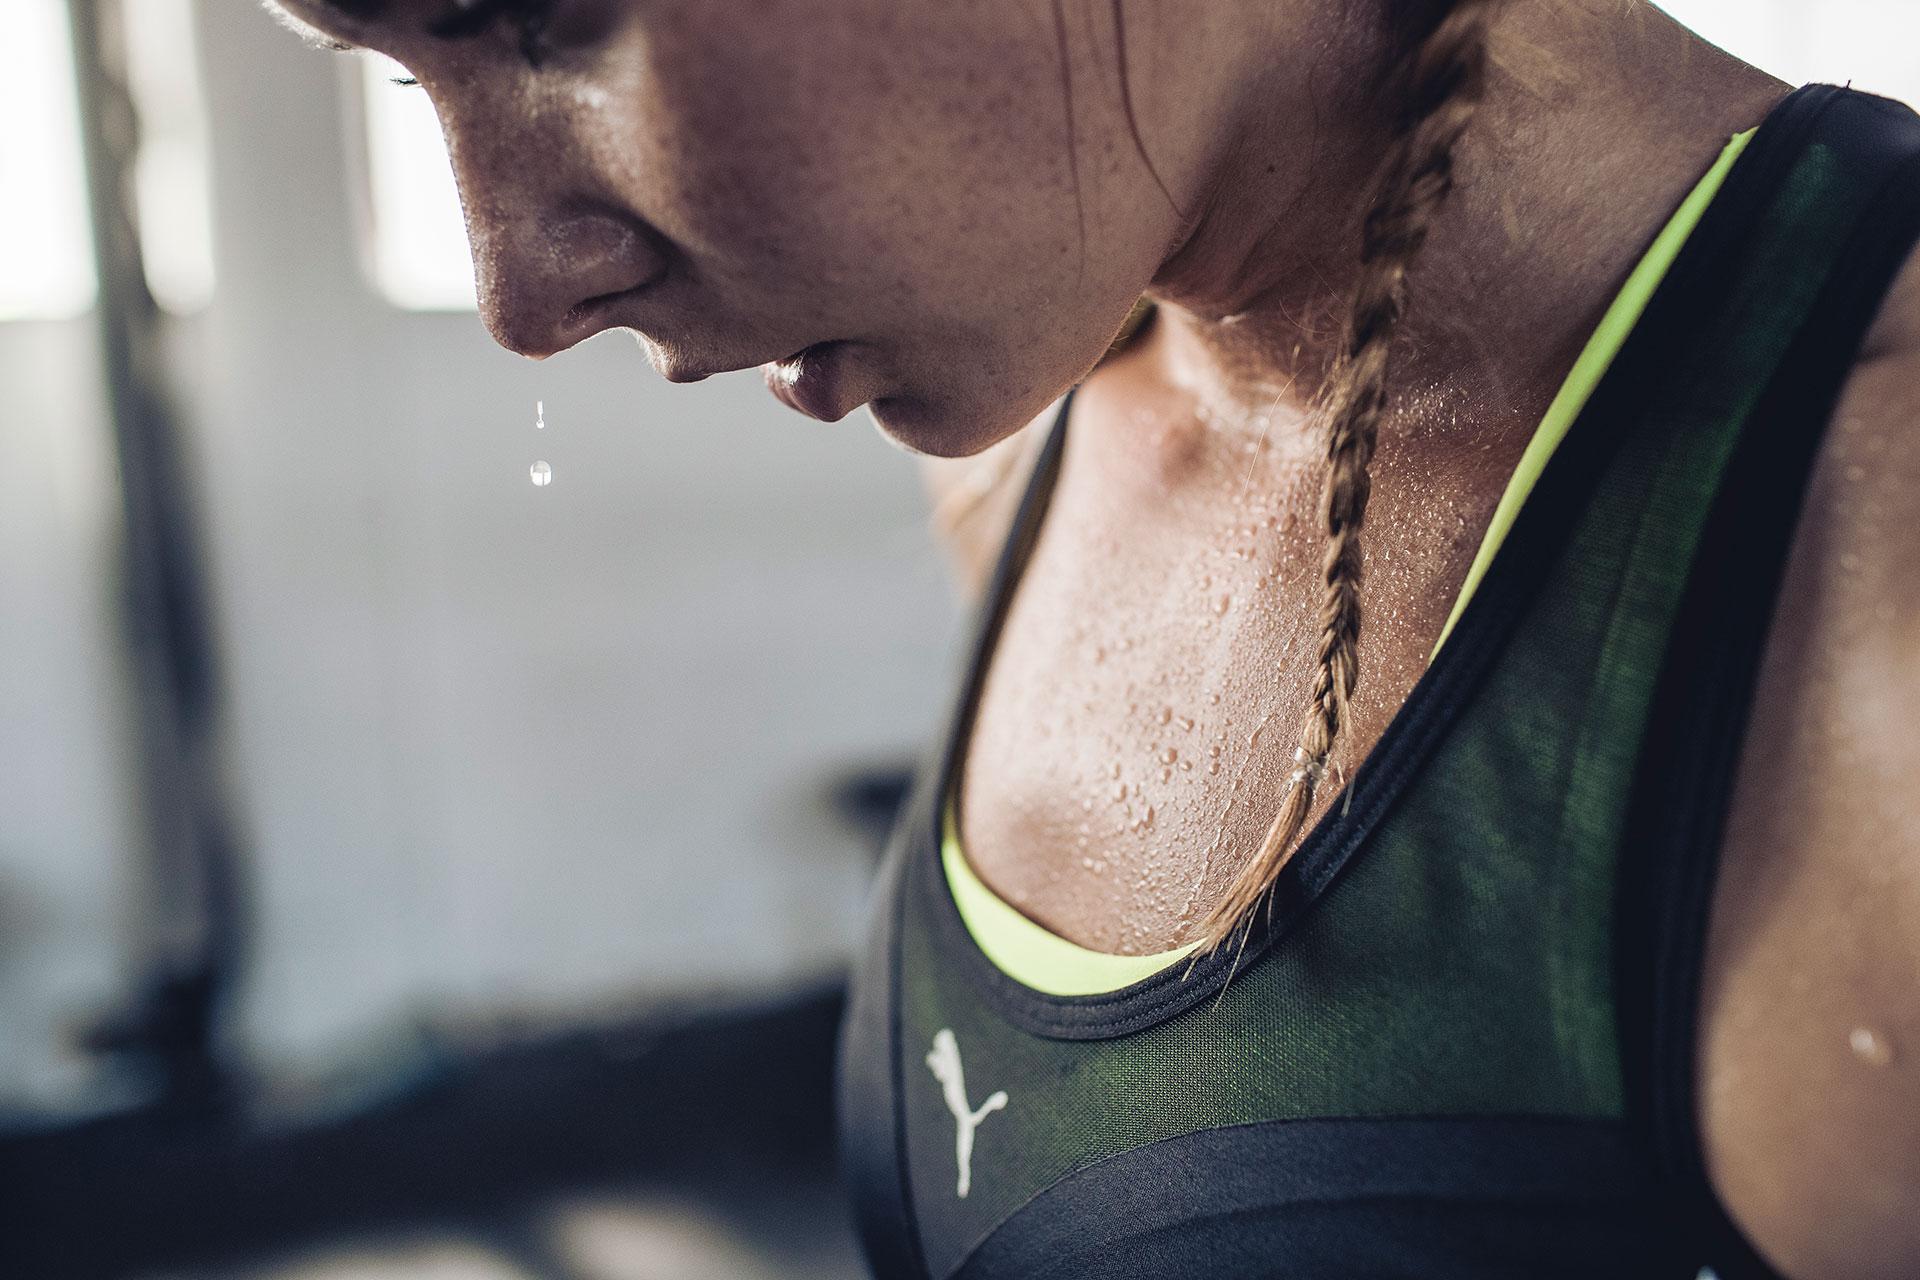 training sport fotografie fitness crossfit sport schweiz zuerich schweiss